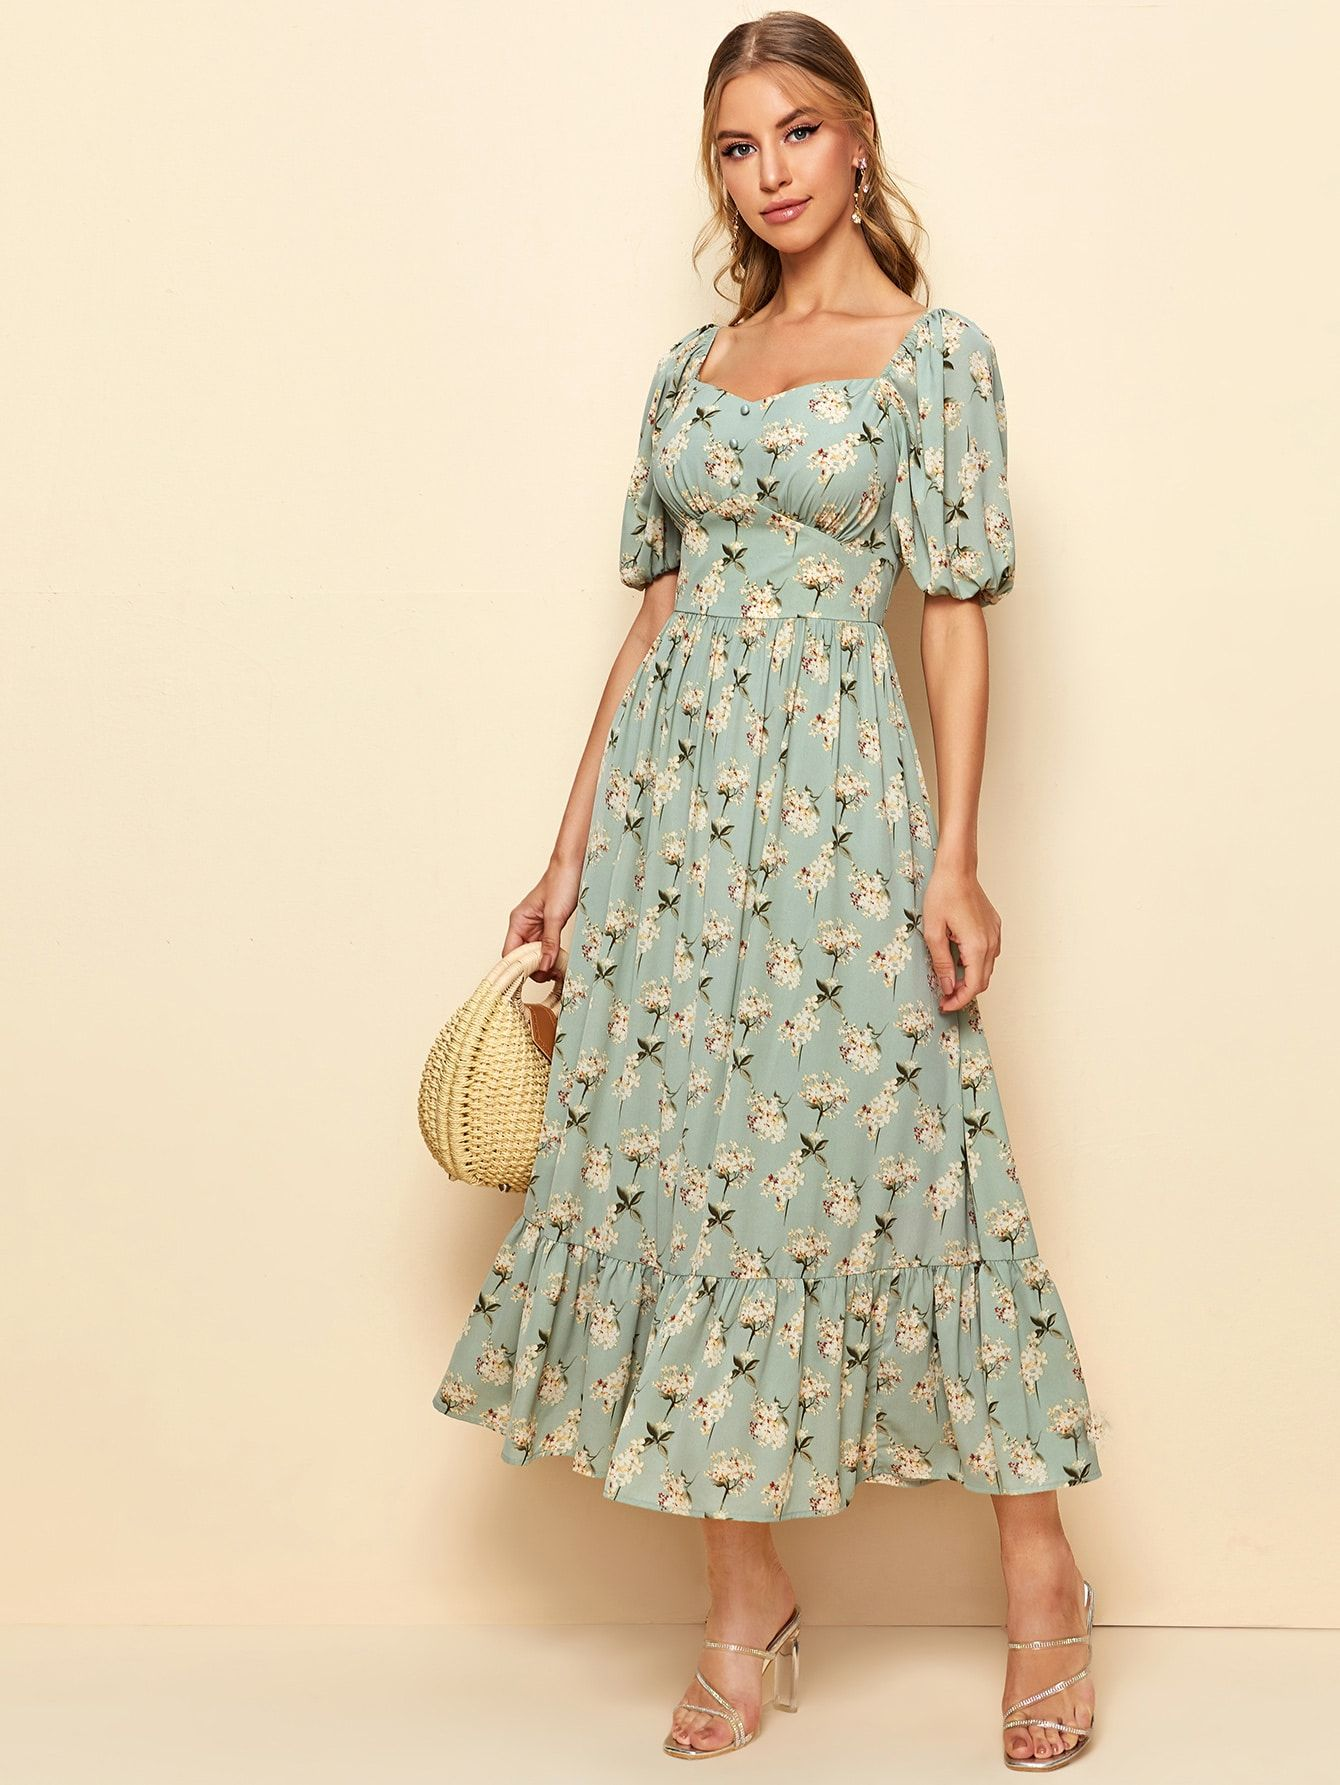 Button Front Sweetheart Neck Floral Print Dress Shein Usa Floral Dress Outfits Print Dress Floral Print Dress [ 1785 x 1340 Pixel ]